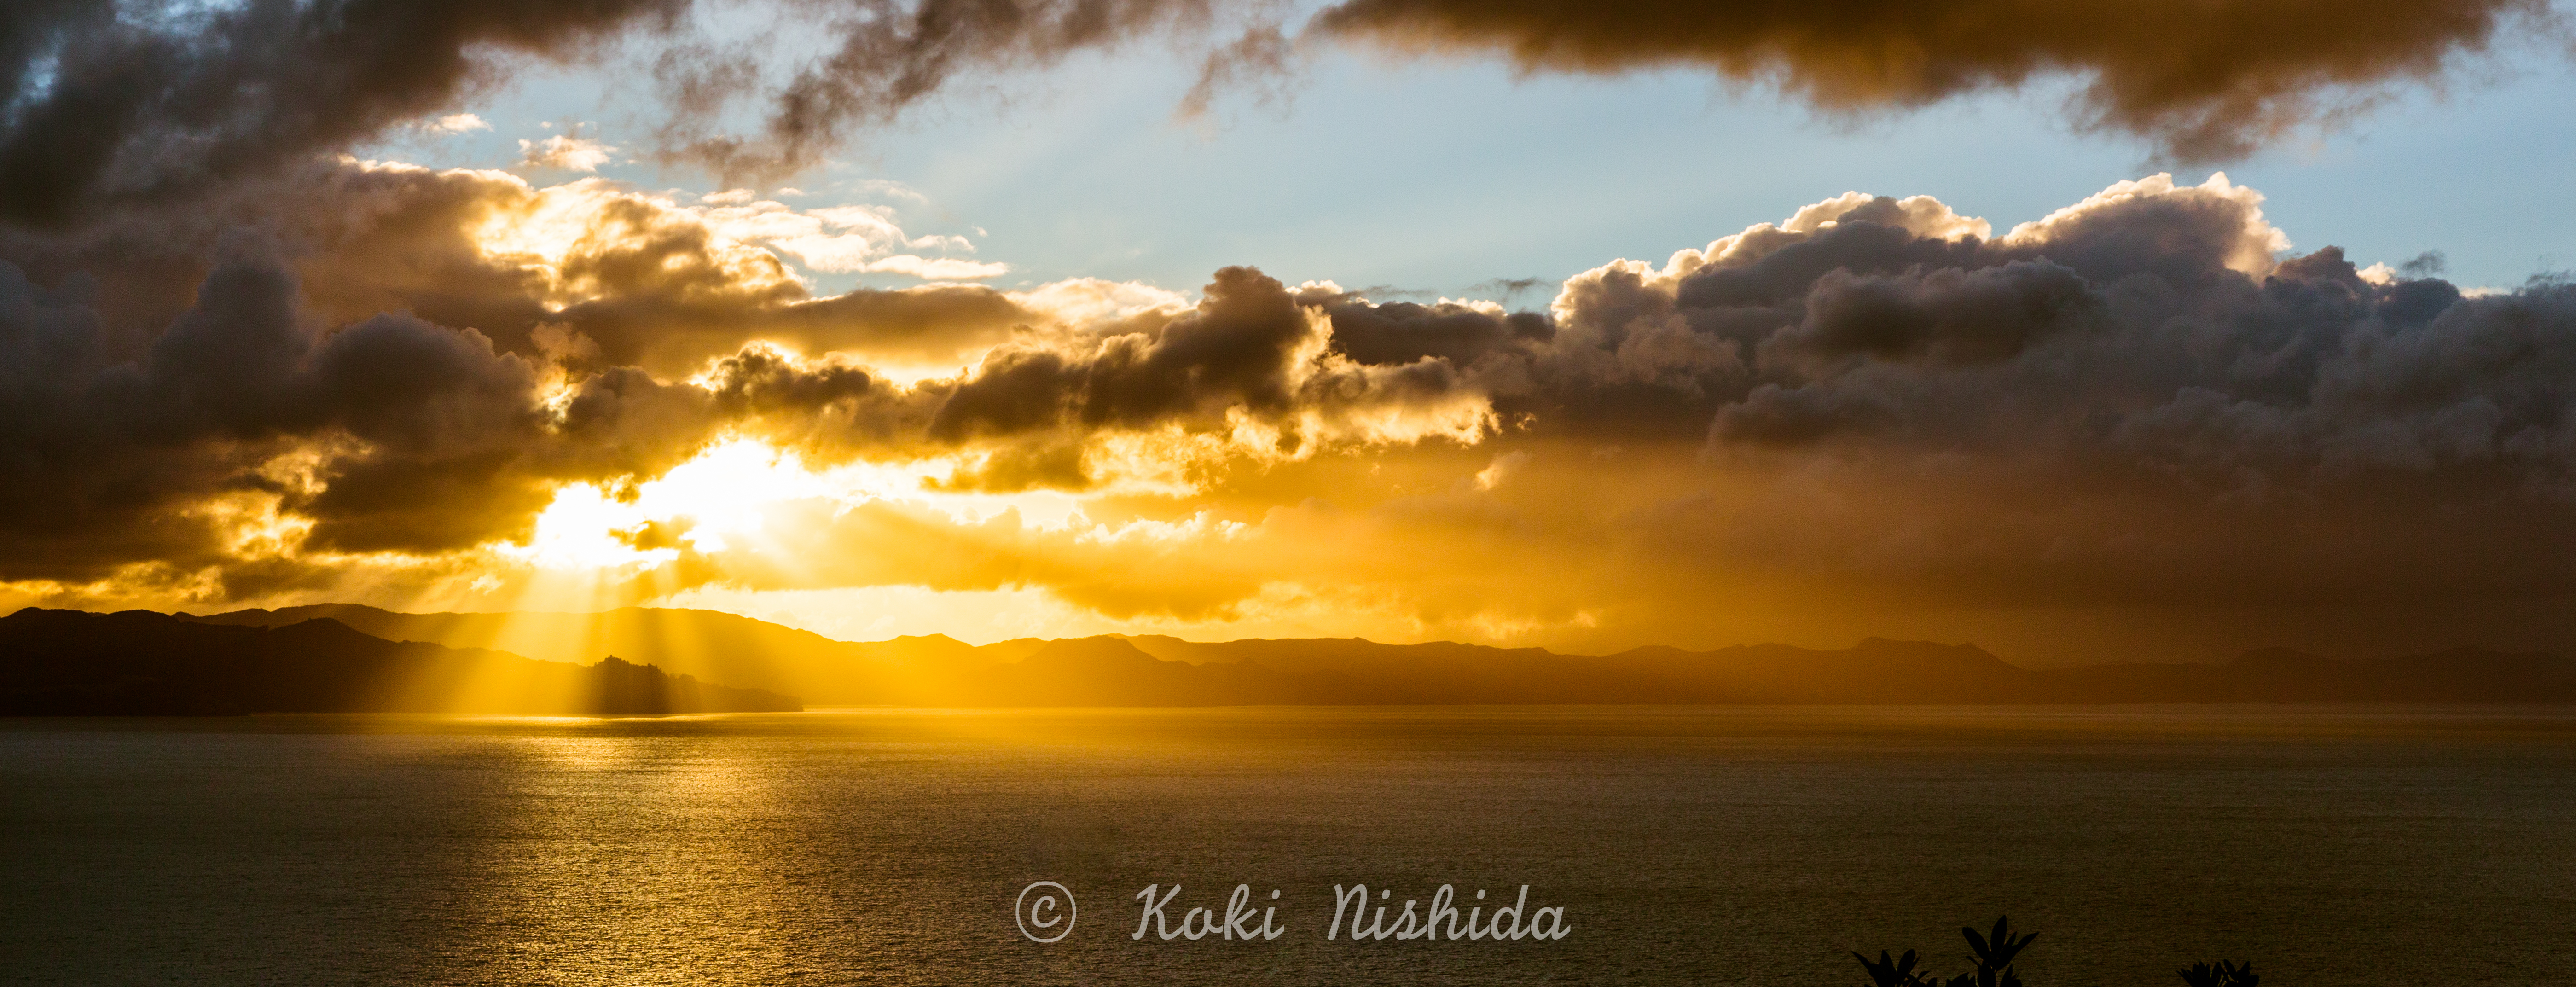 The sunset at Kuaotunu